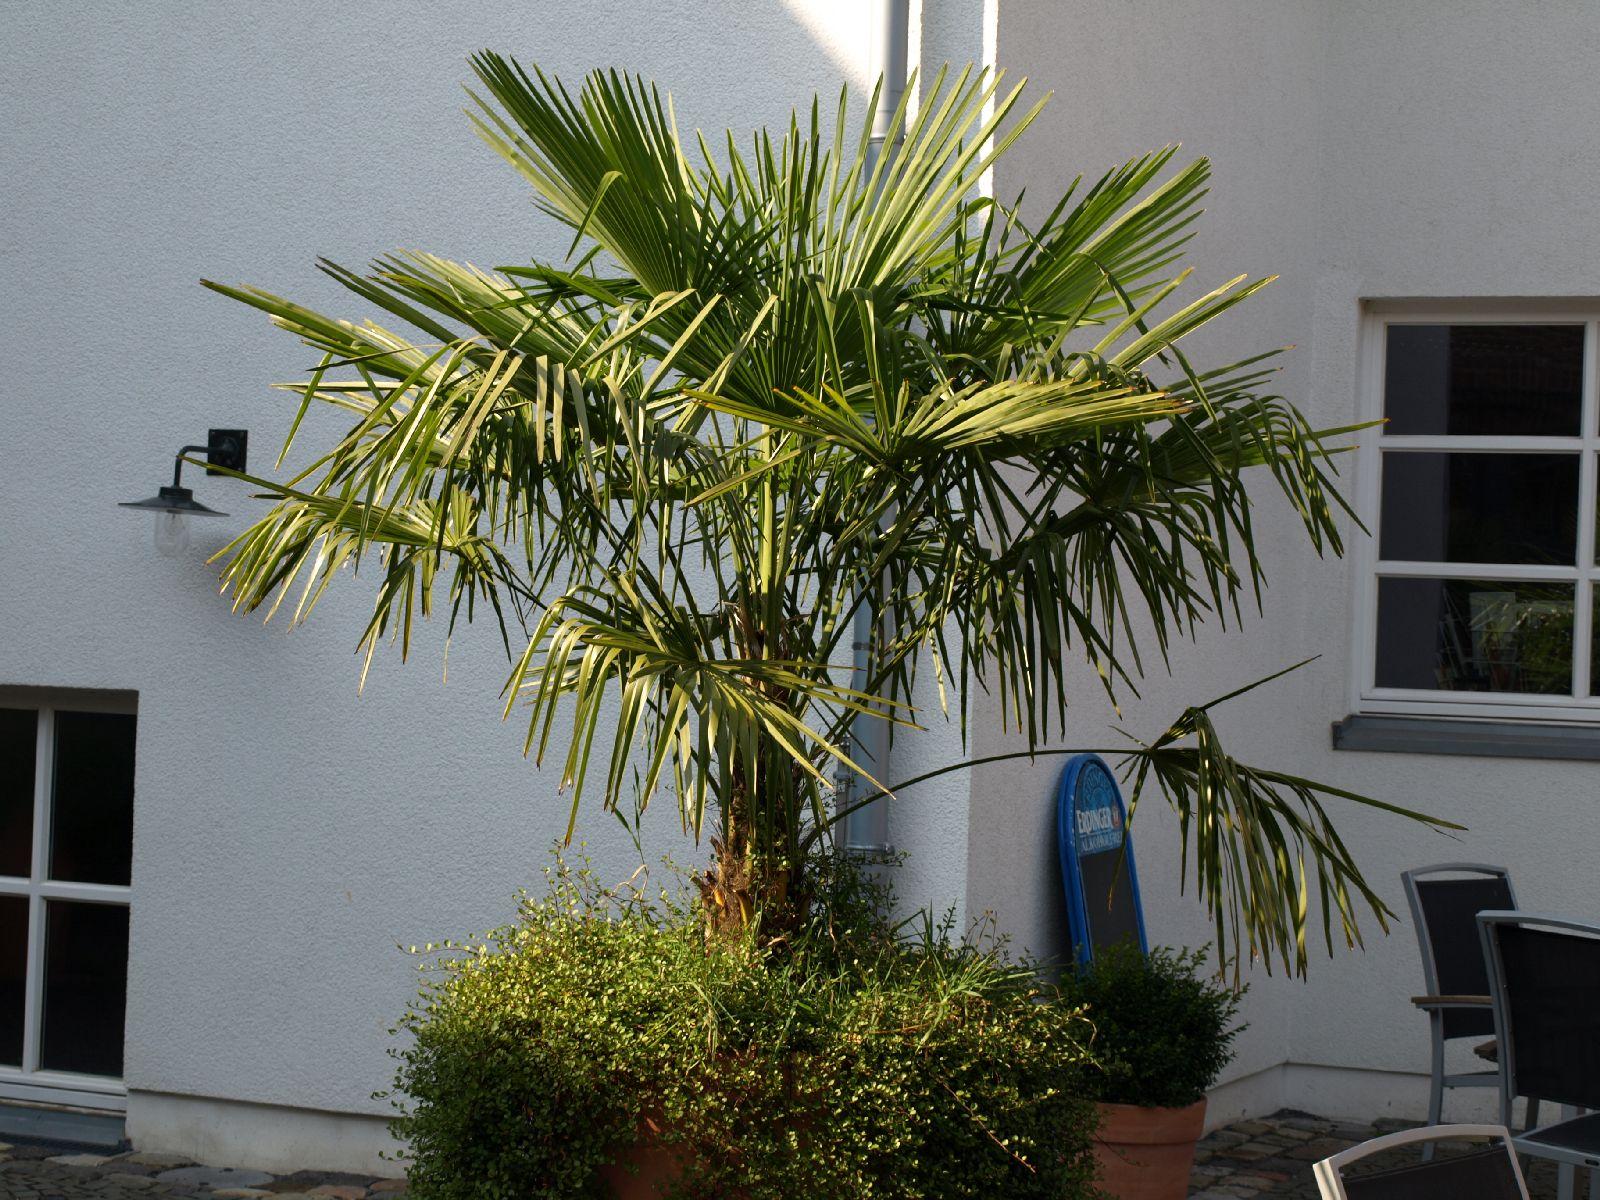 Plants-Trees_Photo_Texture_B_P9205290